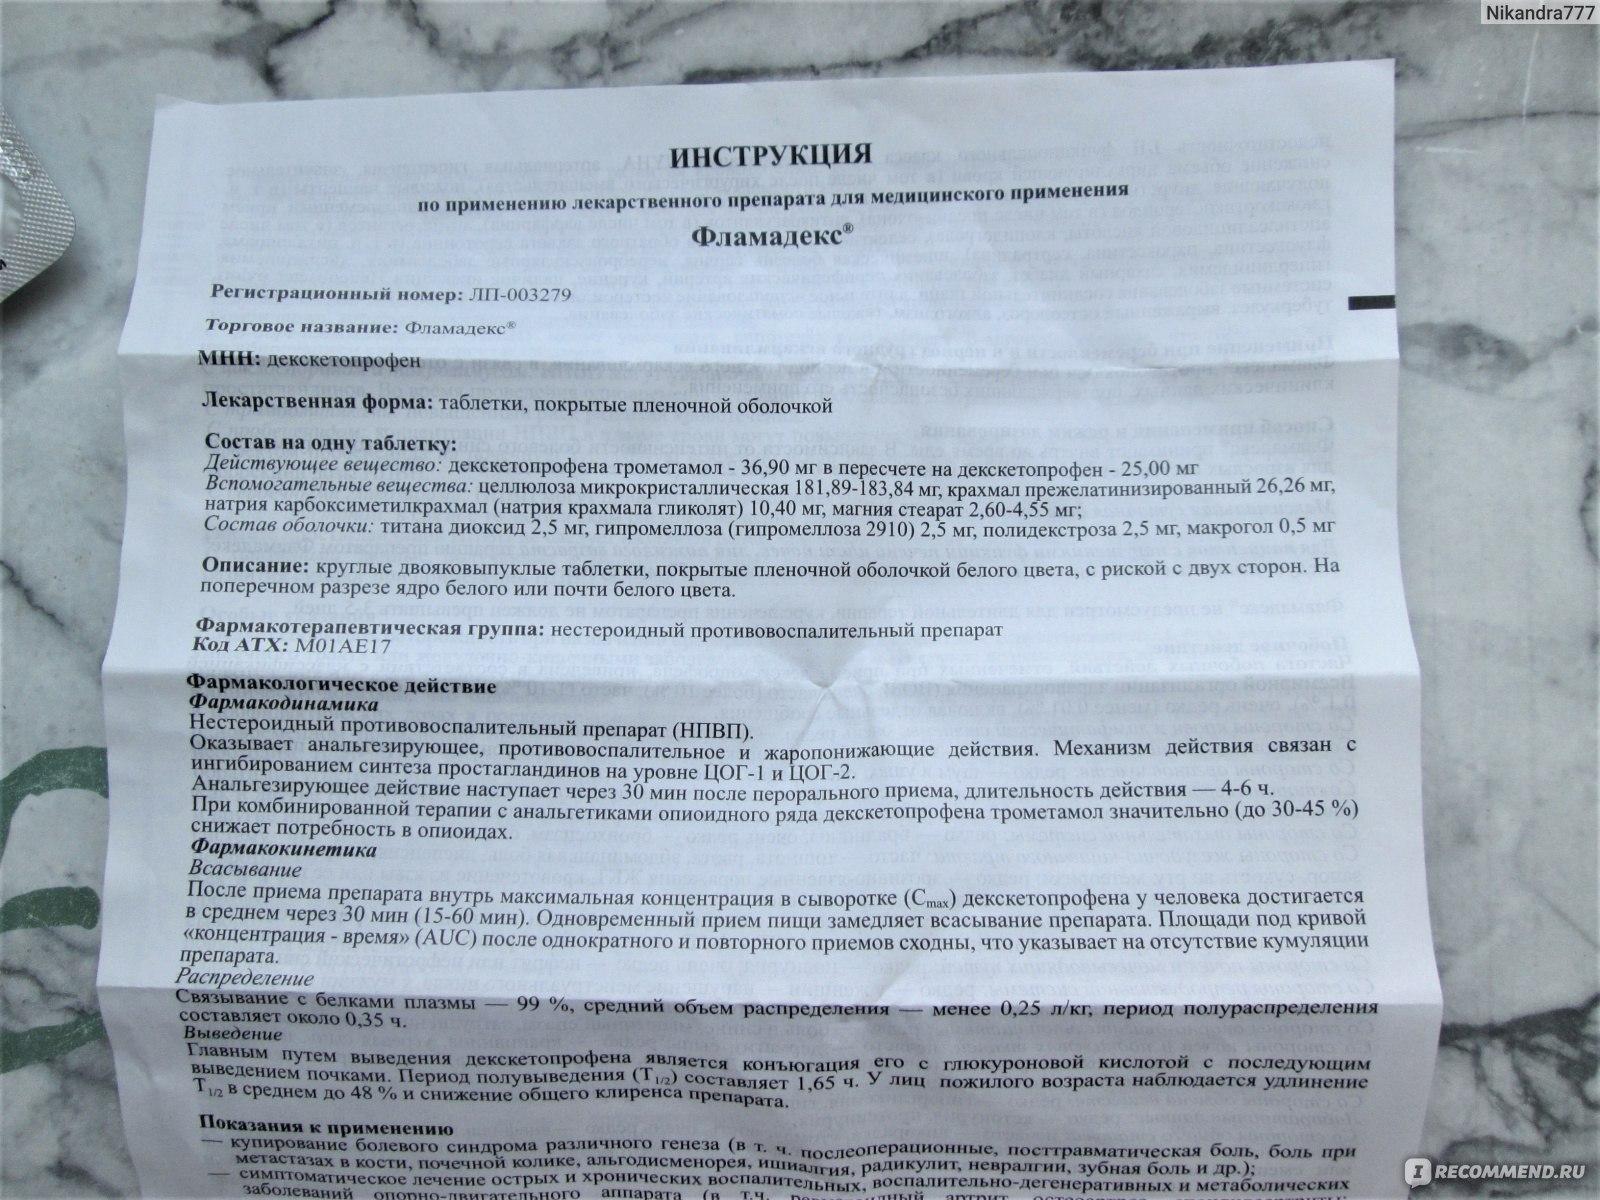 Раствор фламадекс: инструкция по применению, декскетопрофена трометамол 50 мг